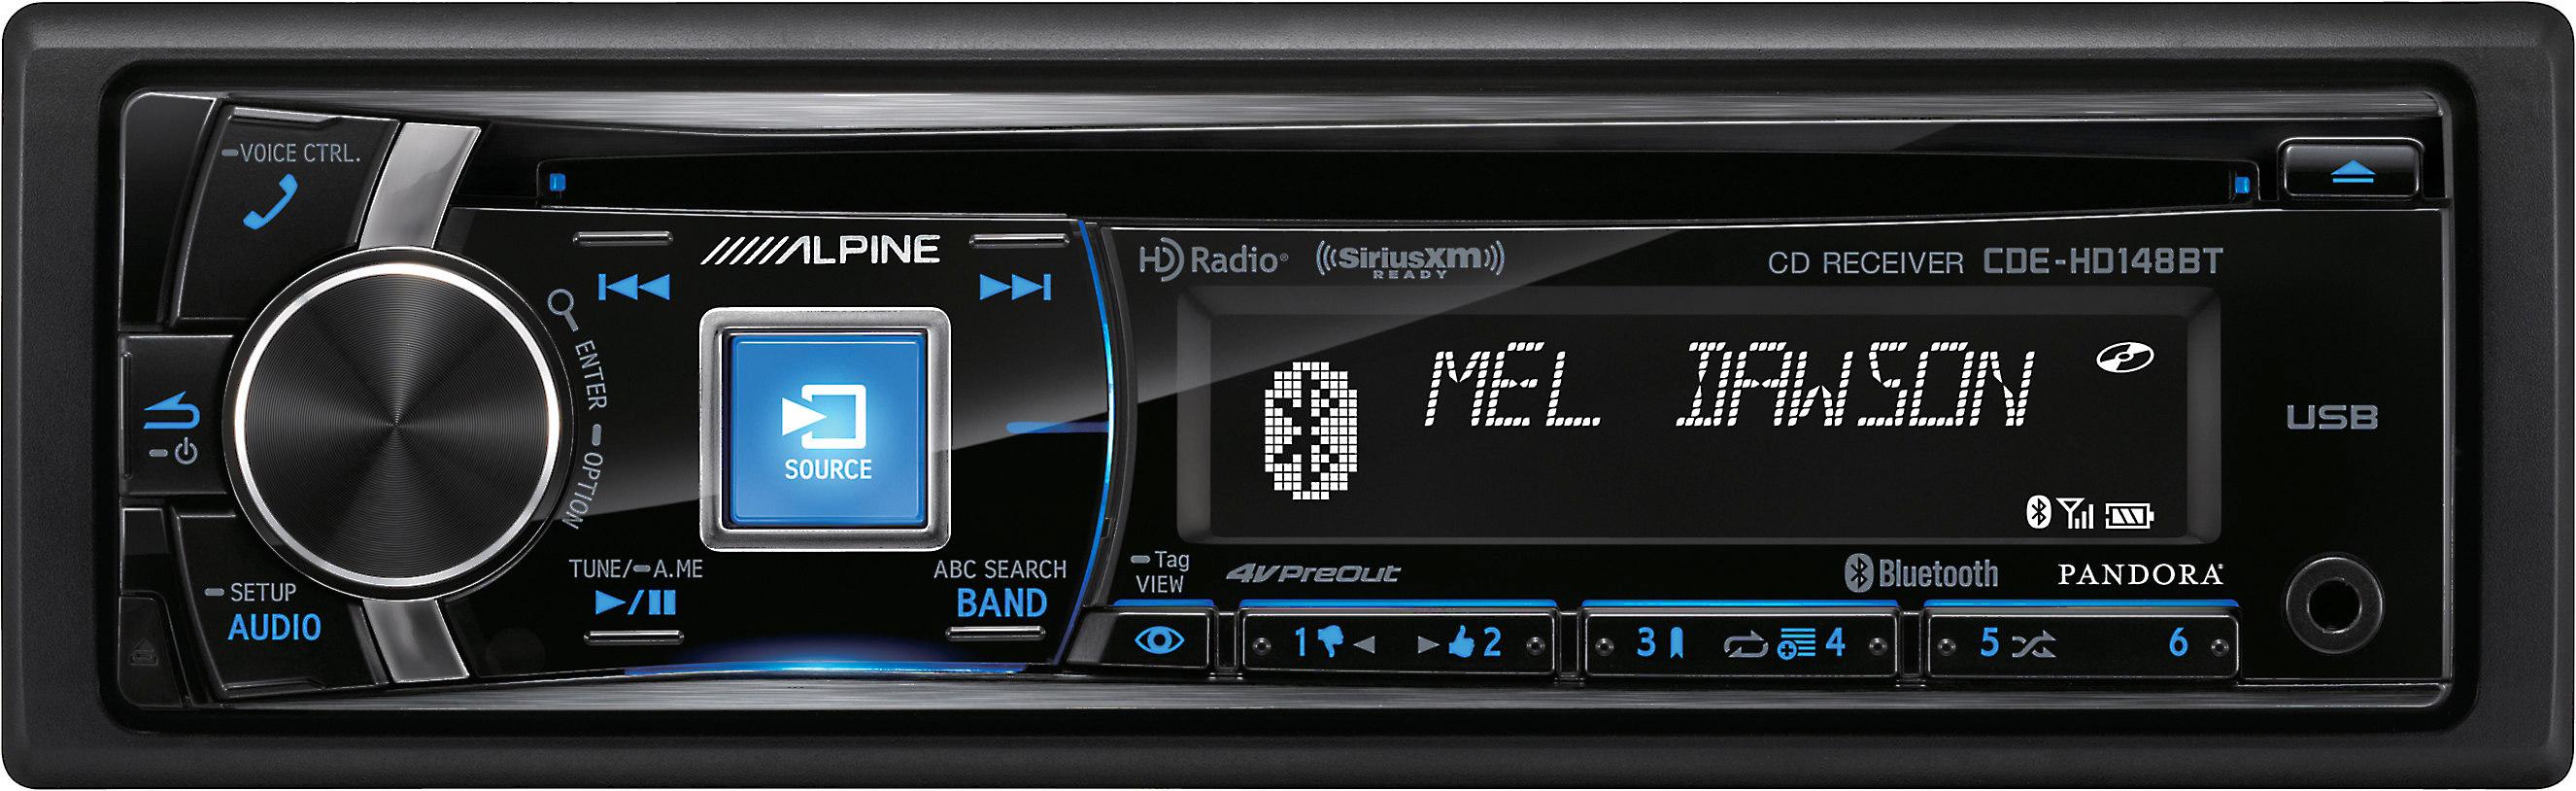 alpine cde hd148bt cd receiver at crutchfield com